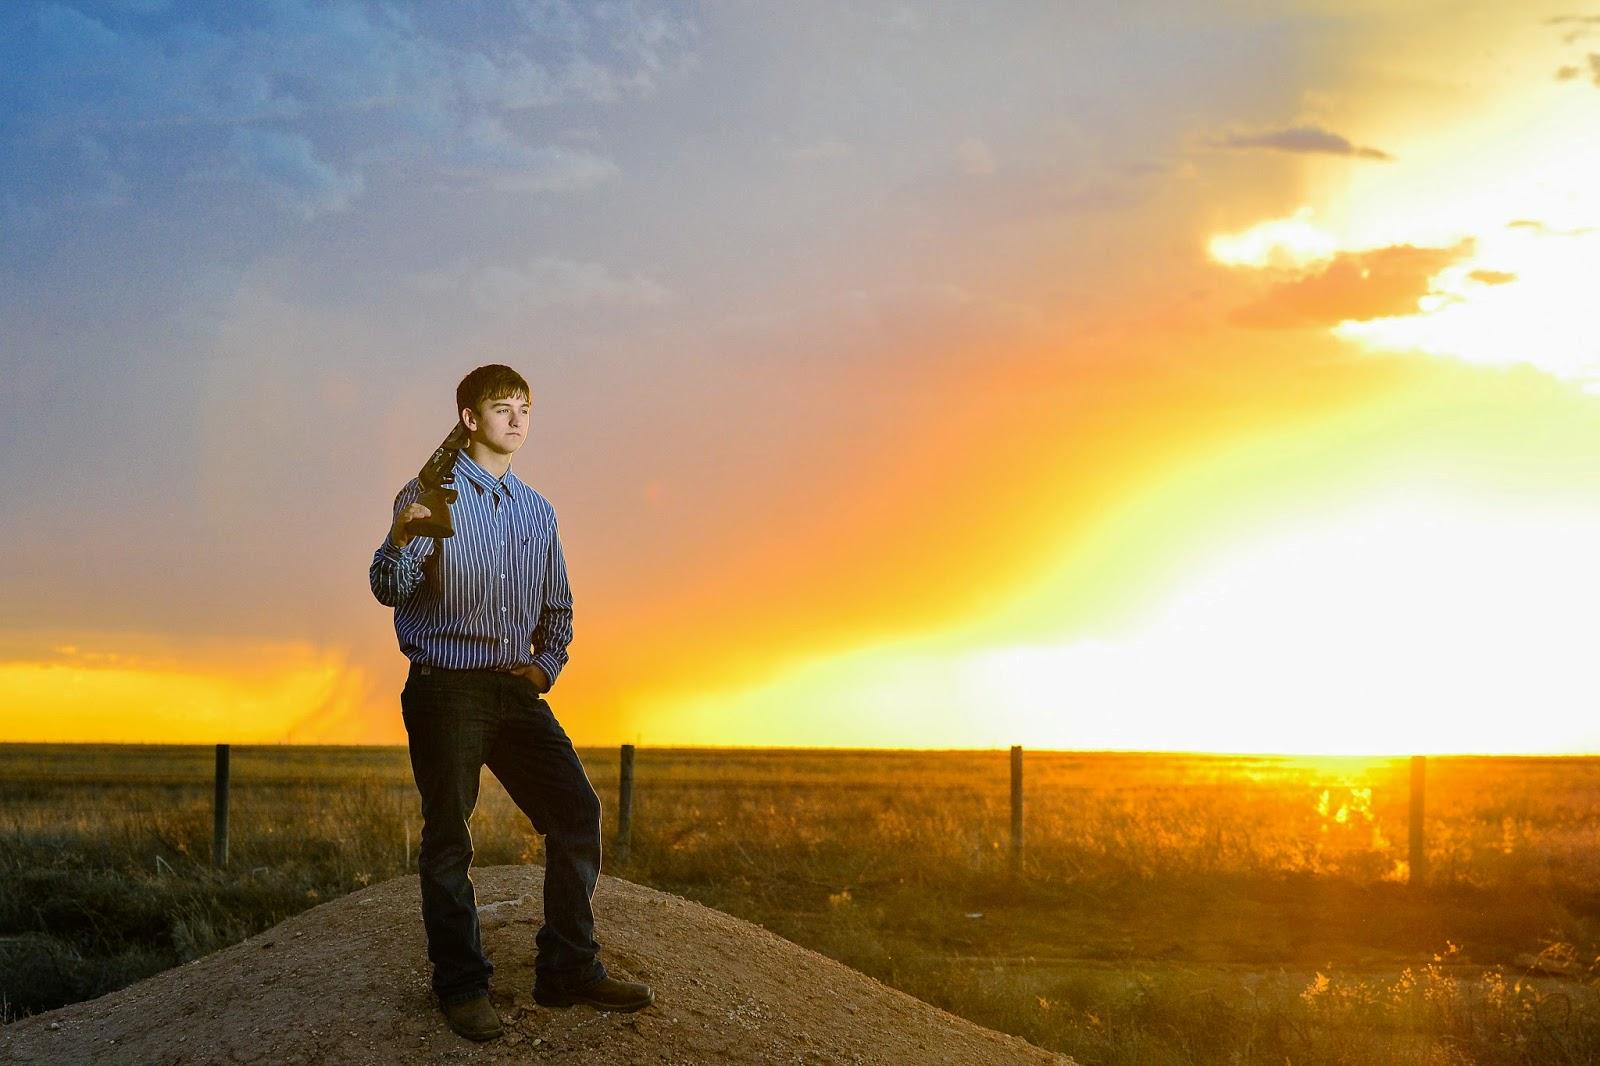 Lubbock TX Senior Photographer, Lubbock Senior Portraits, Lubbock Senior Photography, Lubbock sunset photo, sunset Lubbock TX senior photography